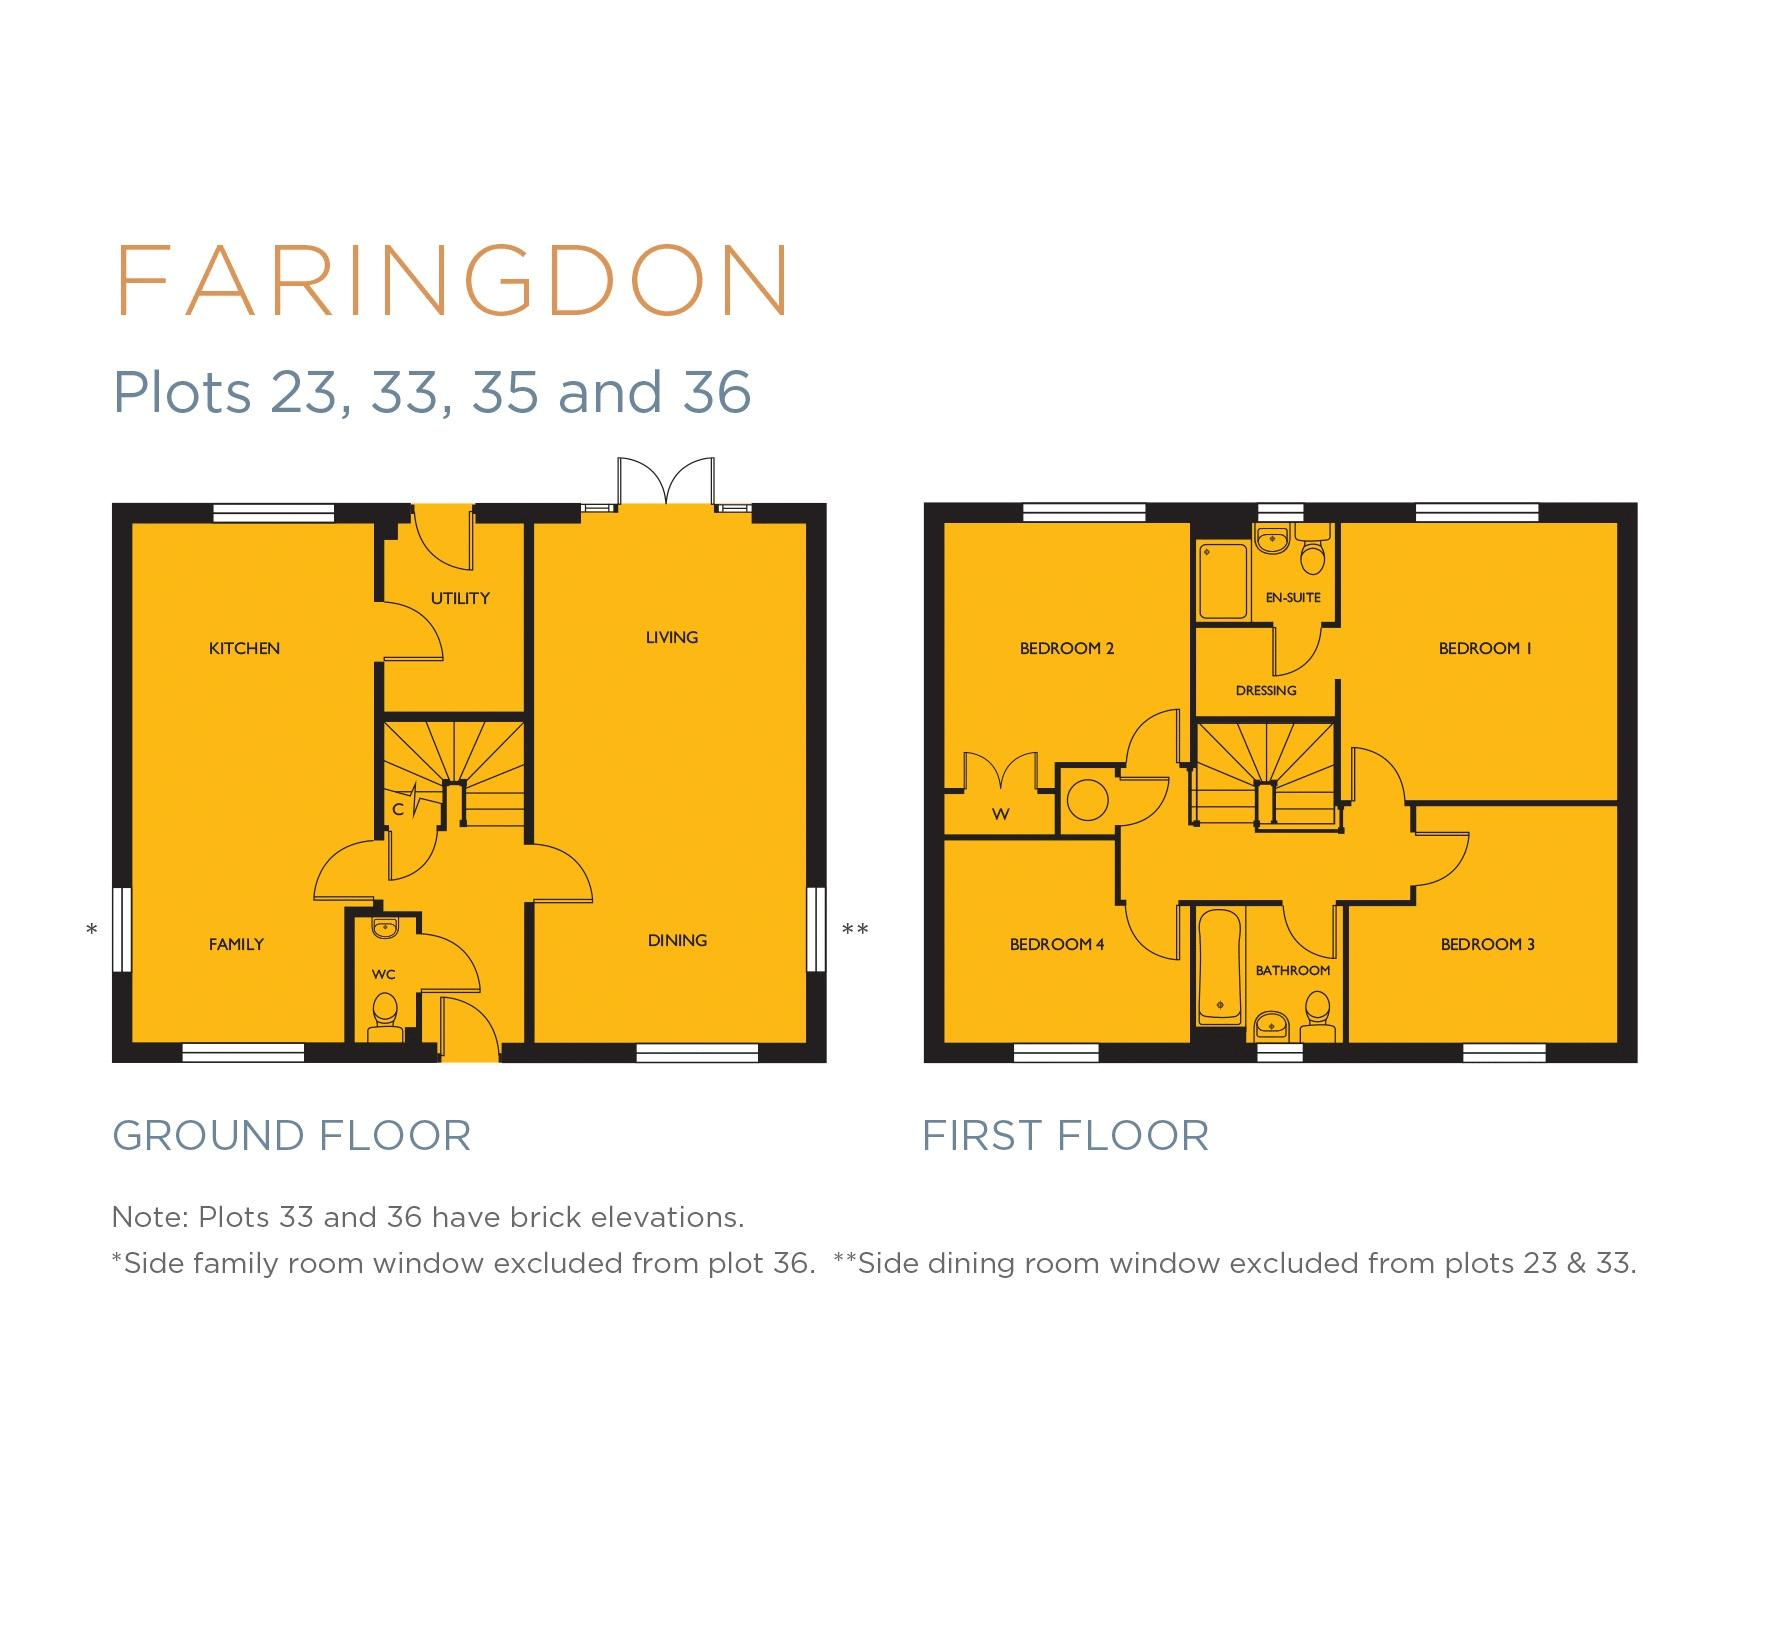 Faringdon Floorplan